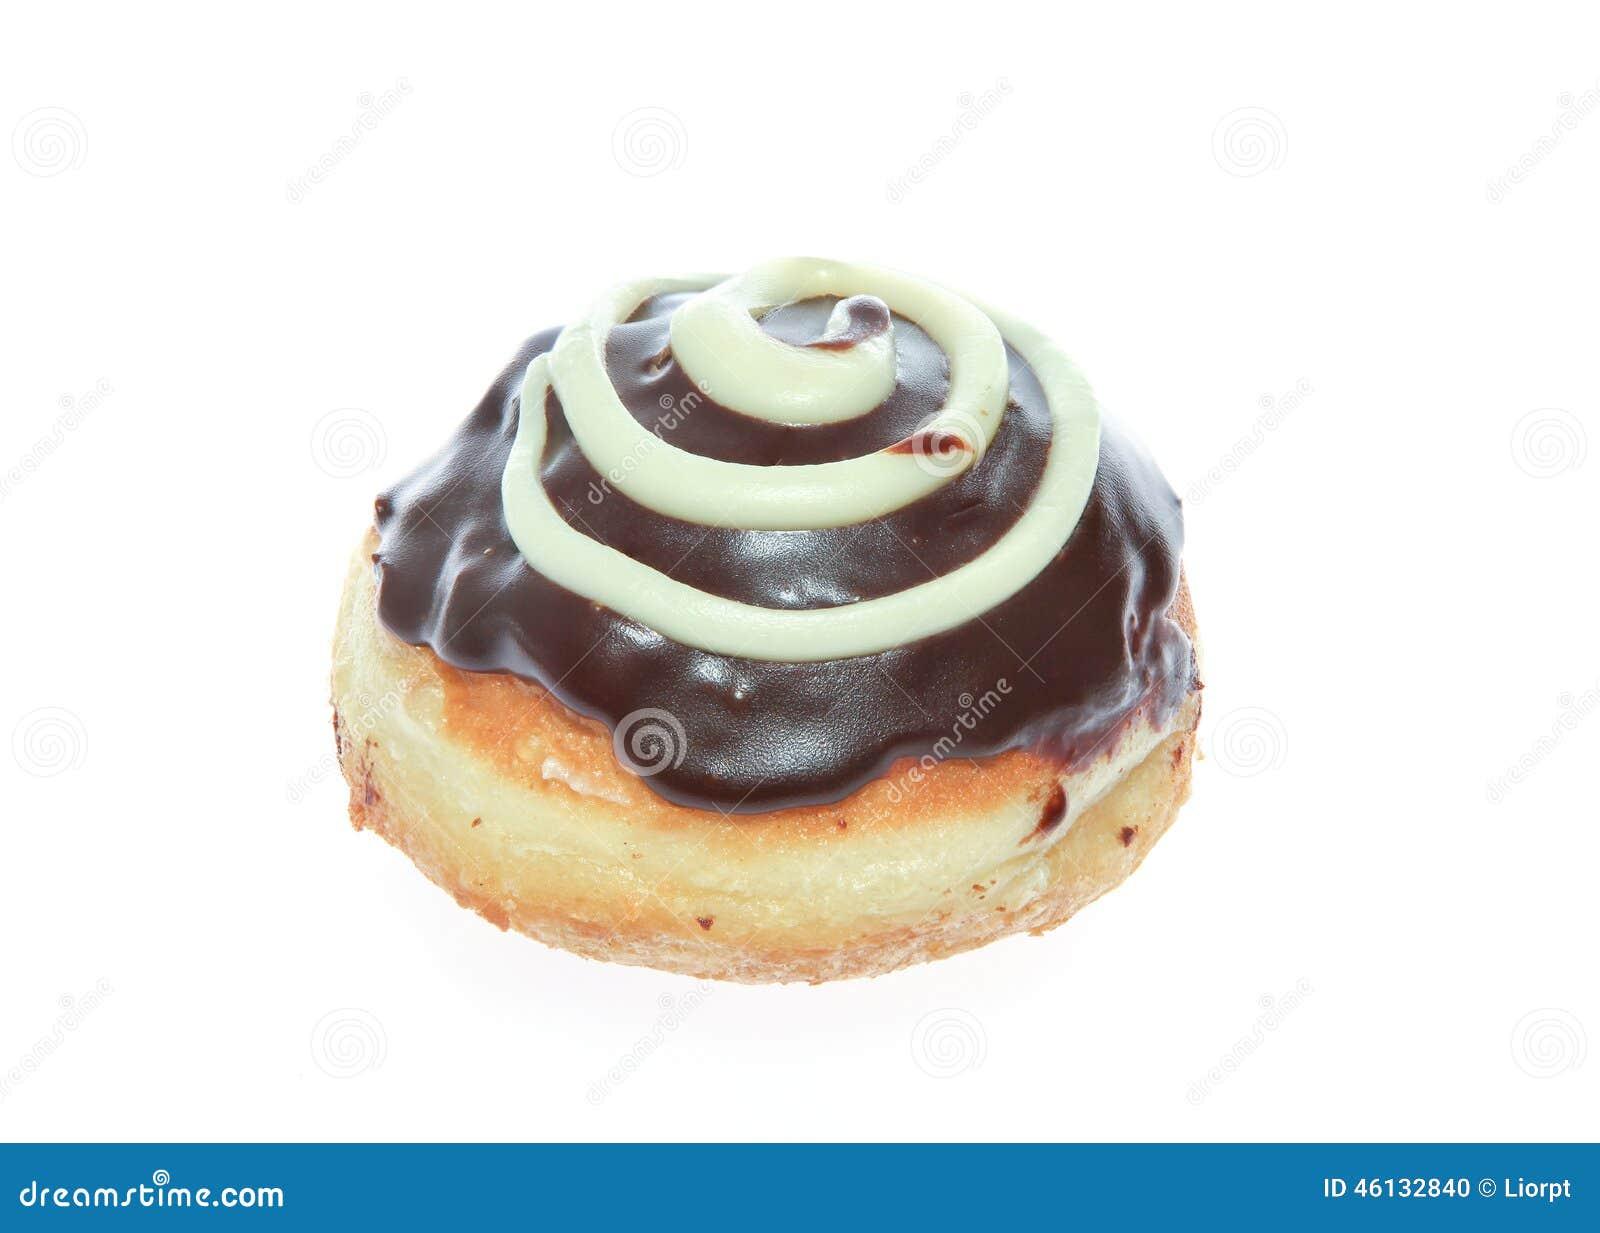 Hanukkah Doughnut Stock Photo - Image: 46132840